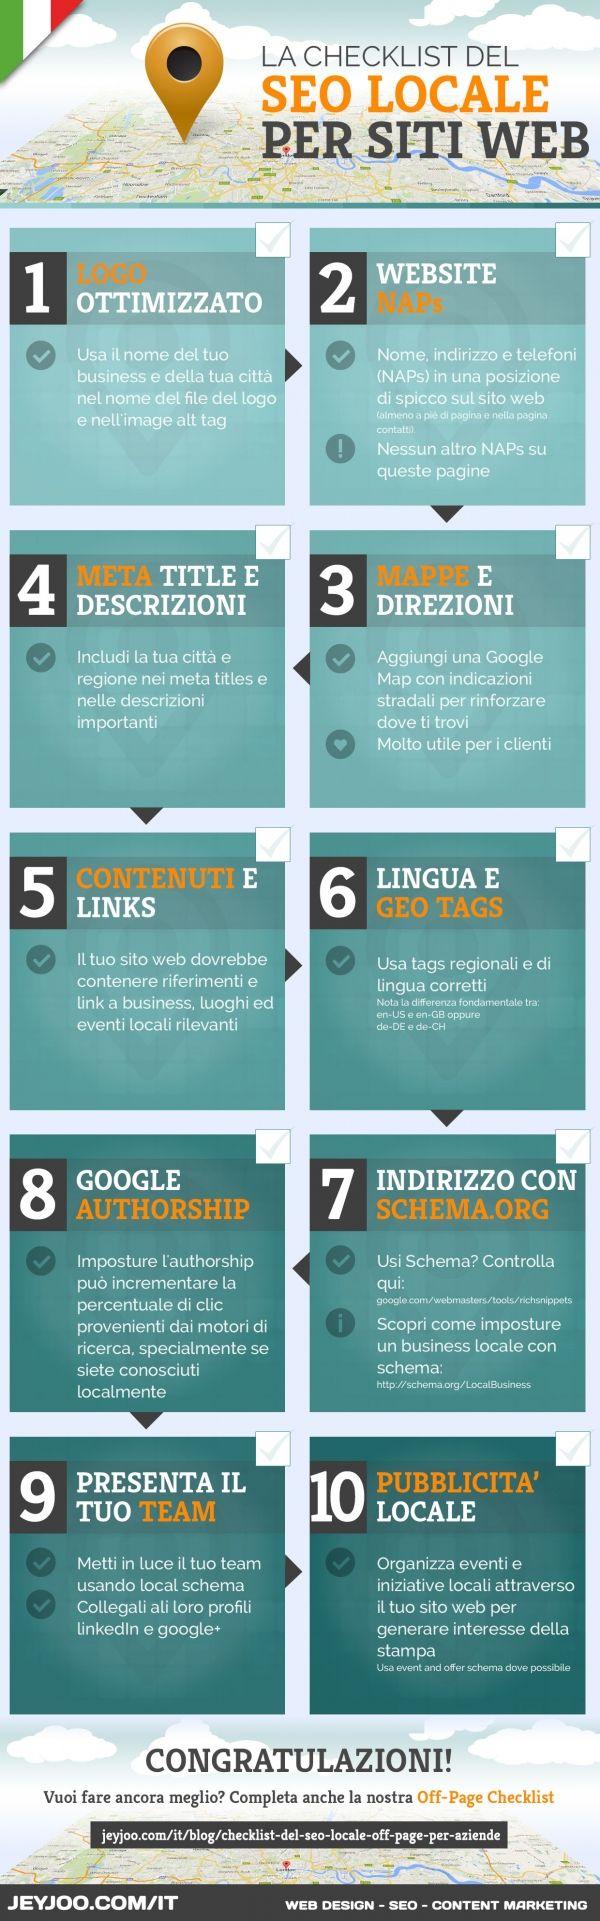 SEO ON-PAGE e ricerca locale per i business locali   #infographic #localseo #seolocale